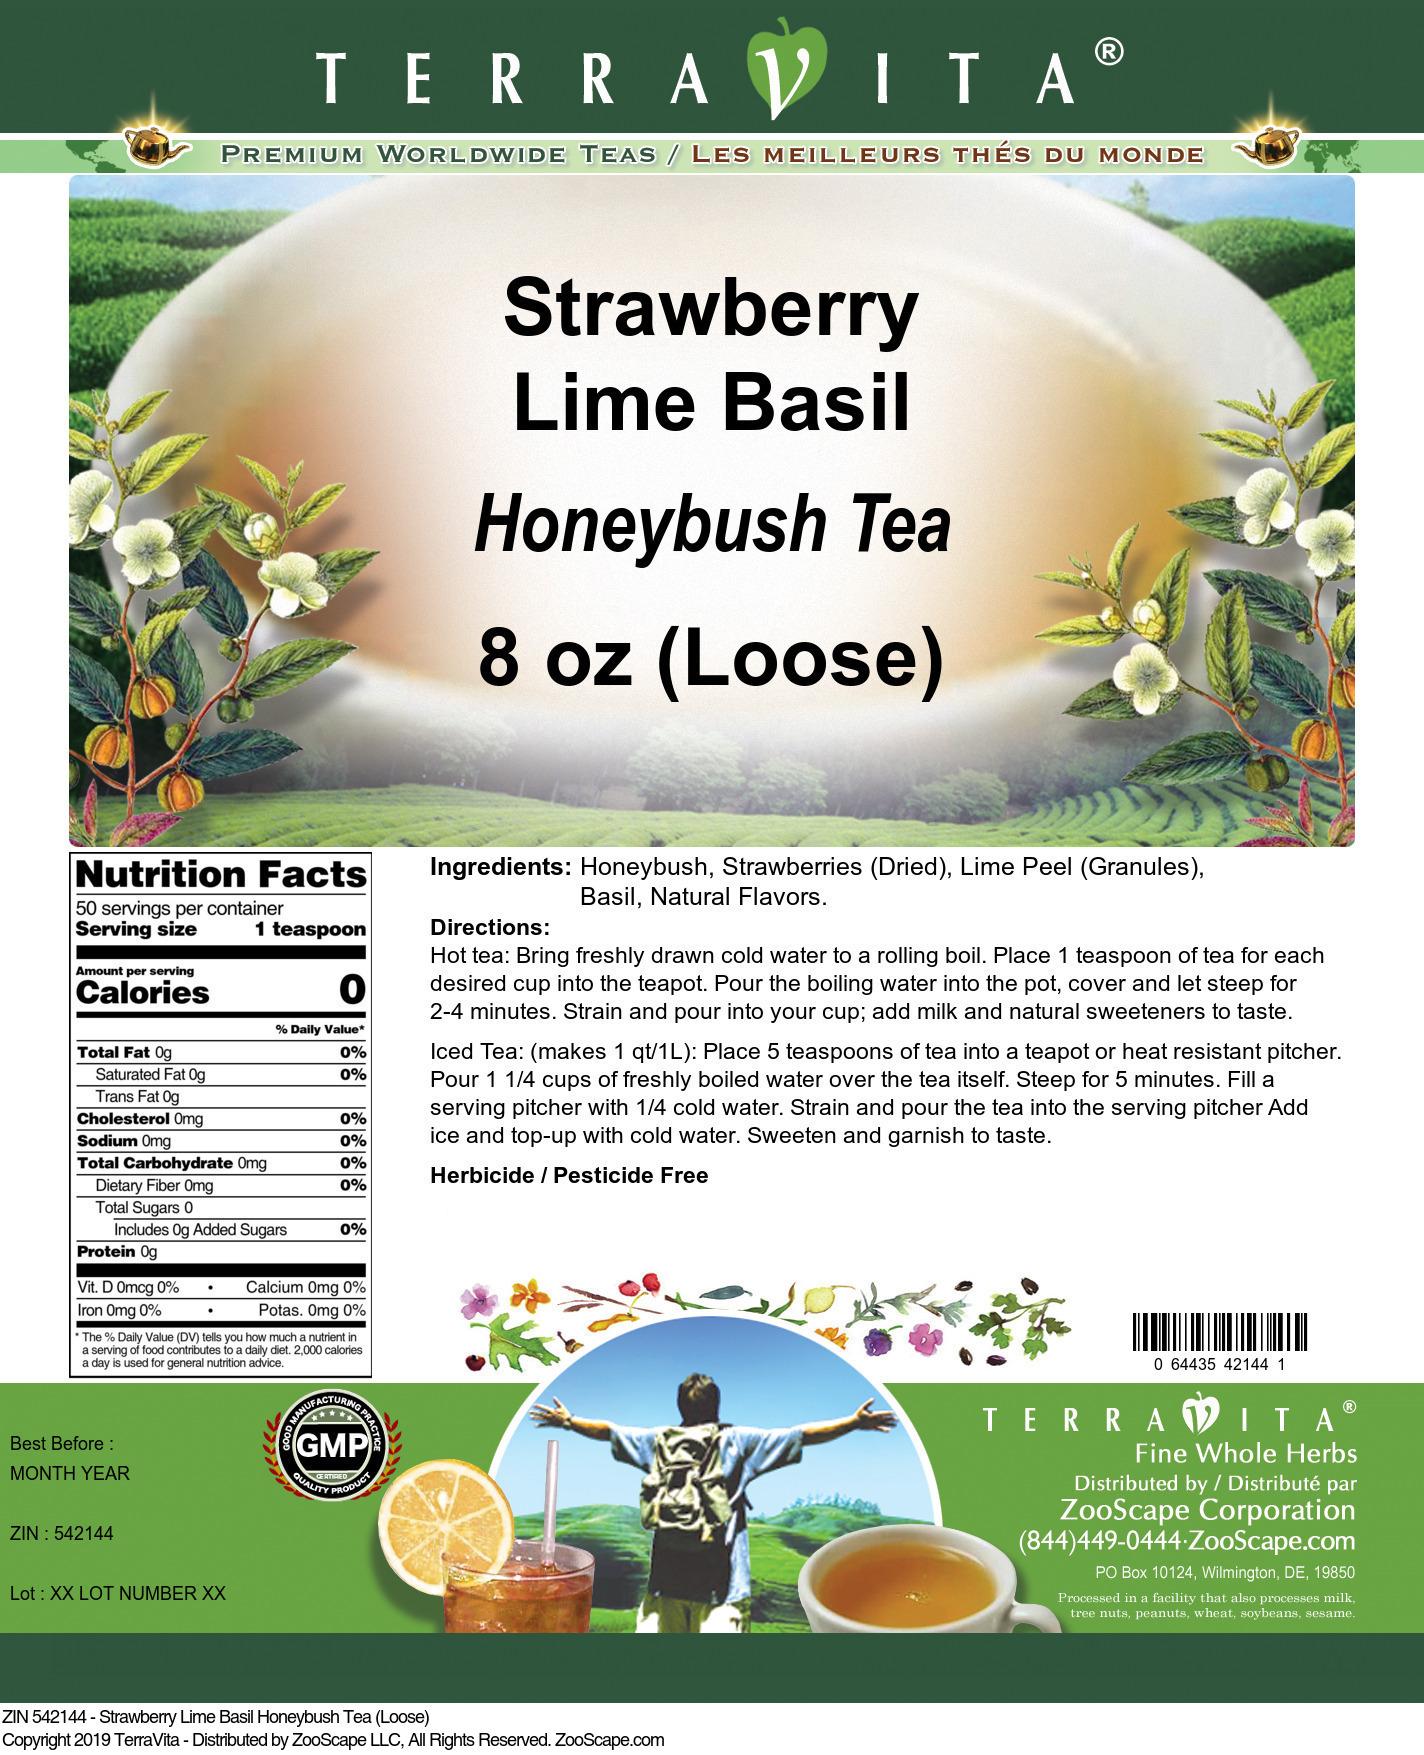 Strawberry Lime Basil Honeybush Tea (Loose)